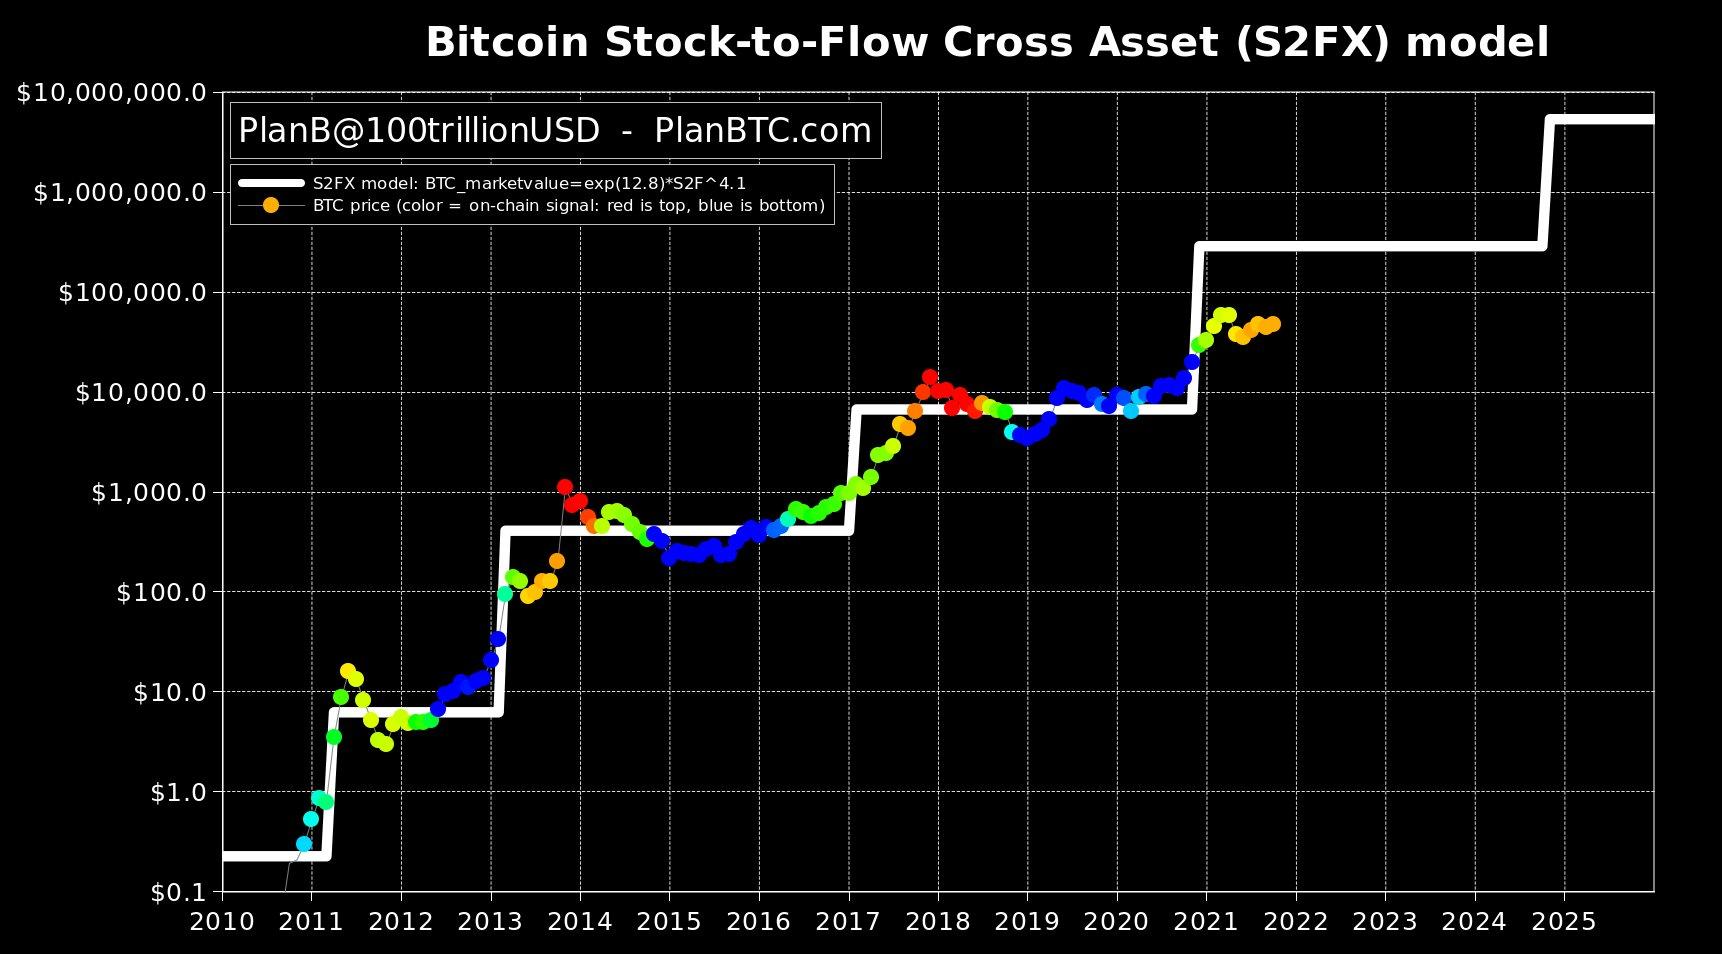 Bitcoin BTC Stock to Flow